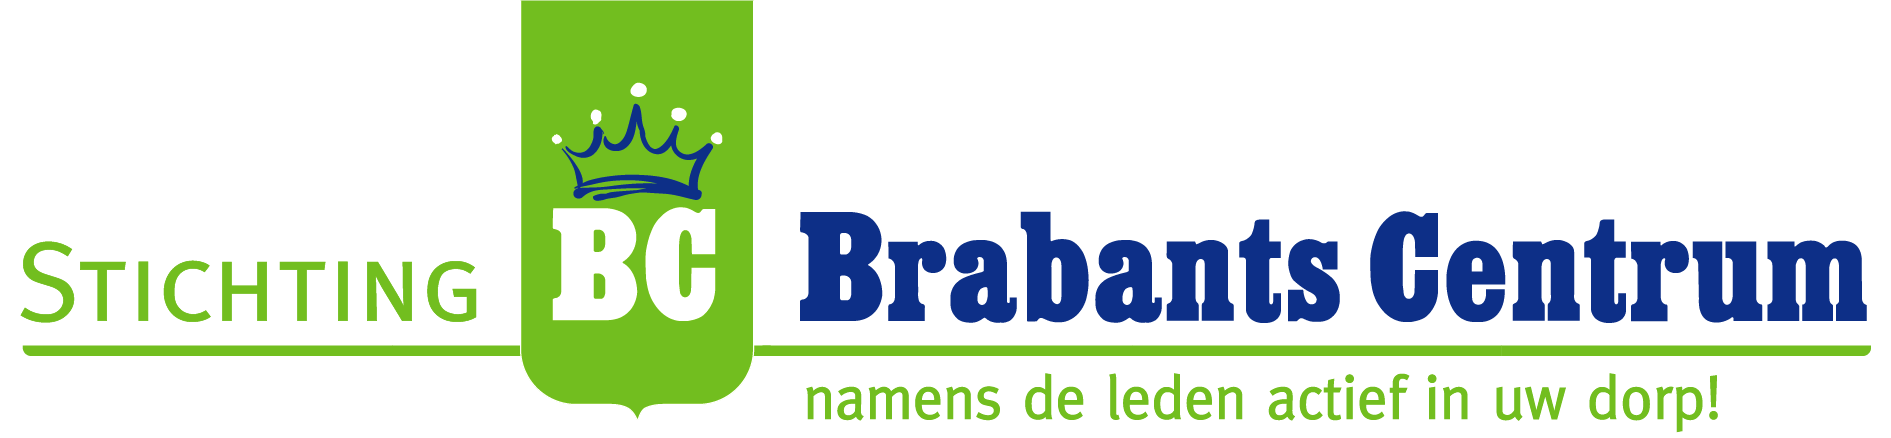 Brabants Centrum